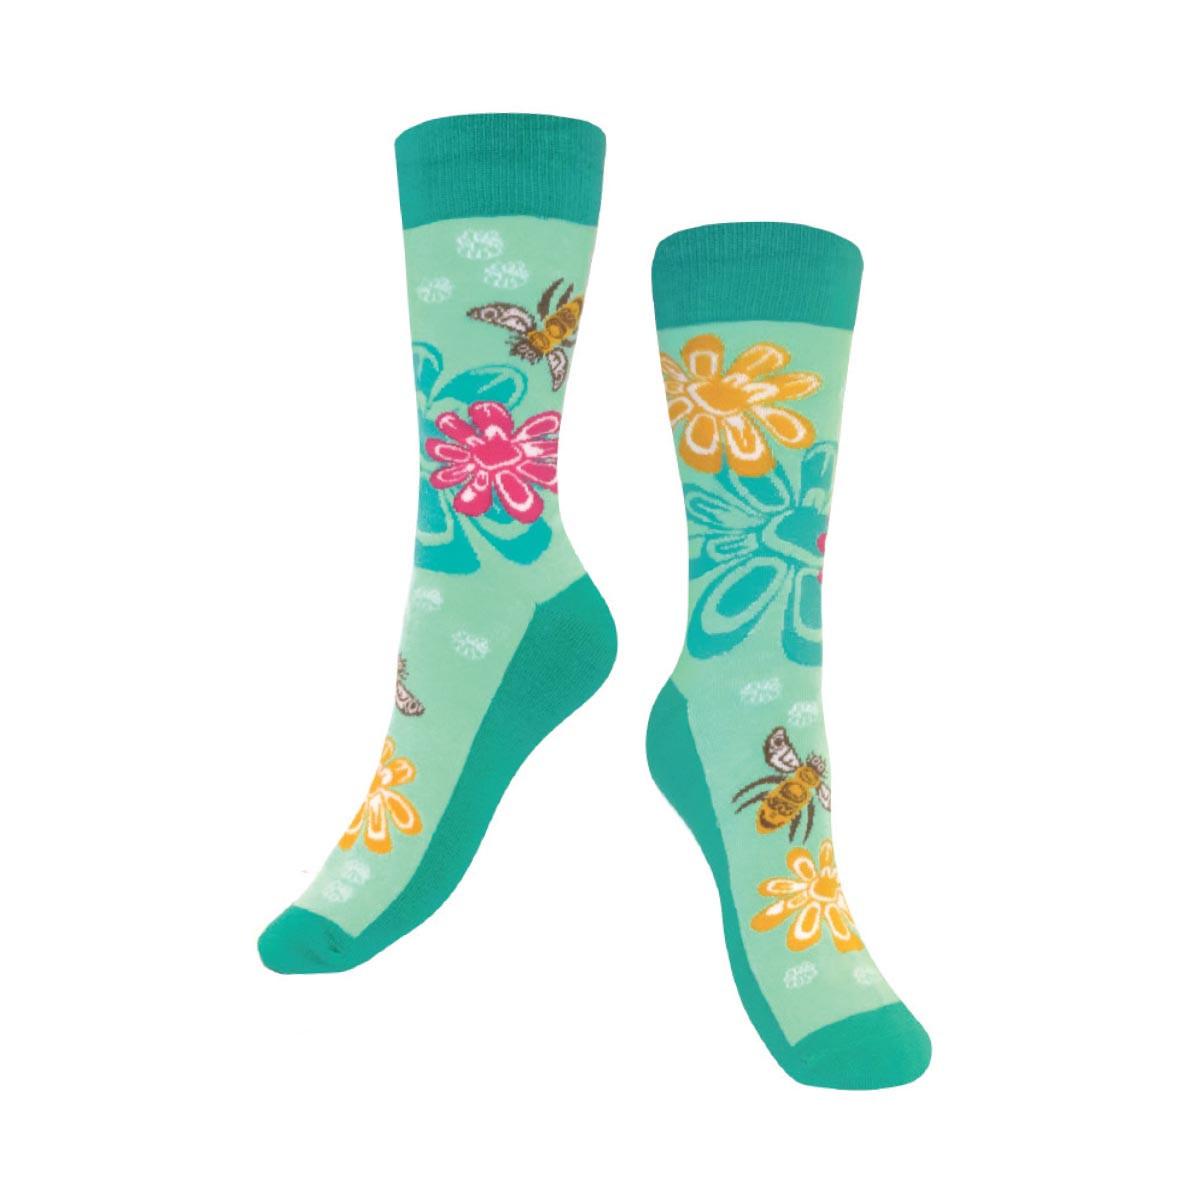 Art Socks - Bee & Blossoms